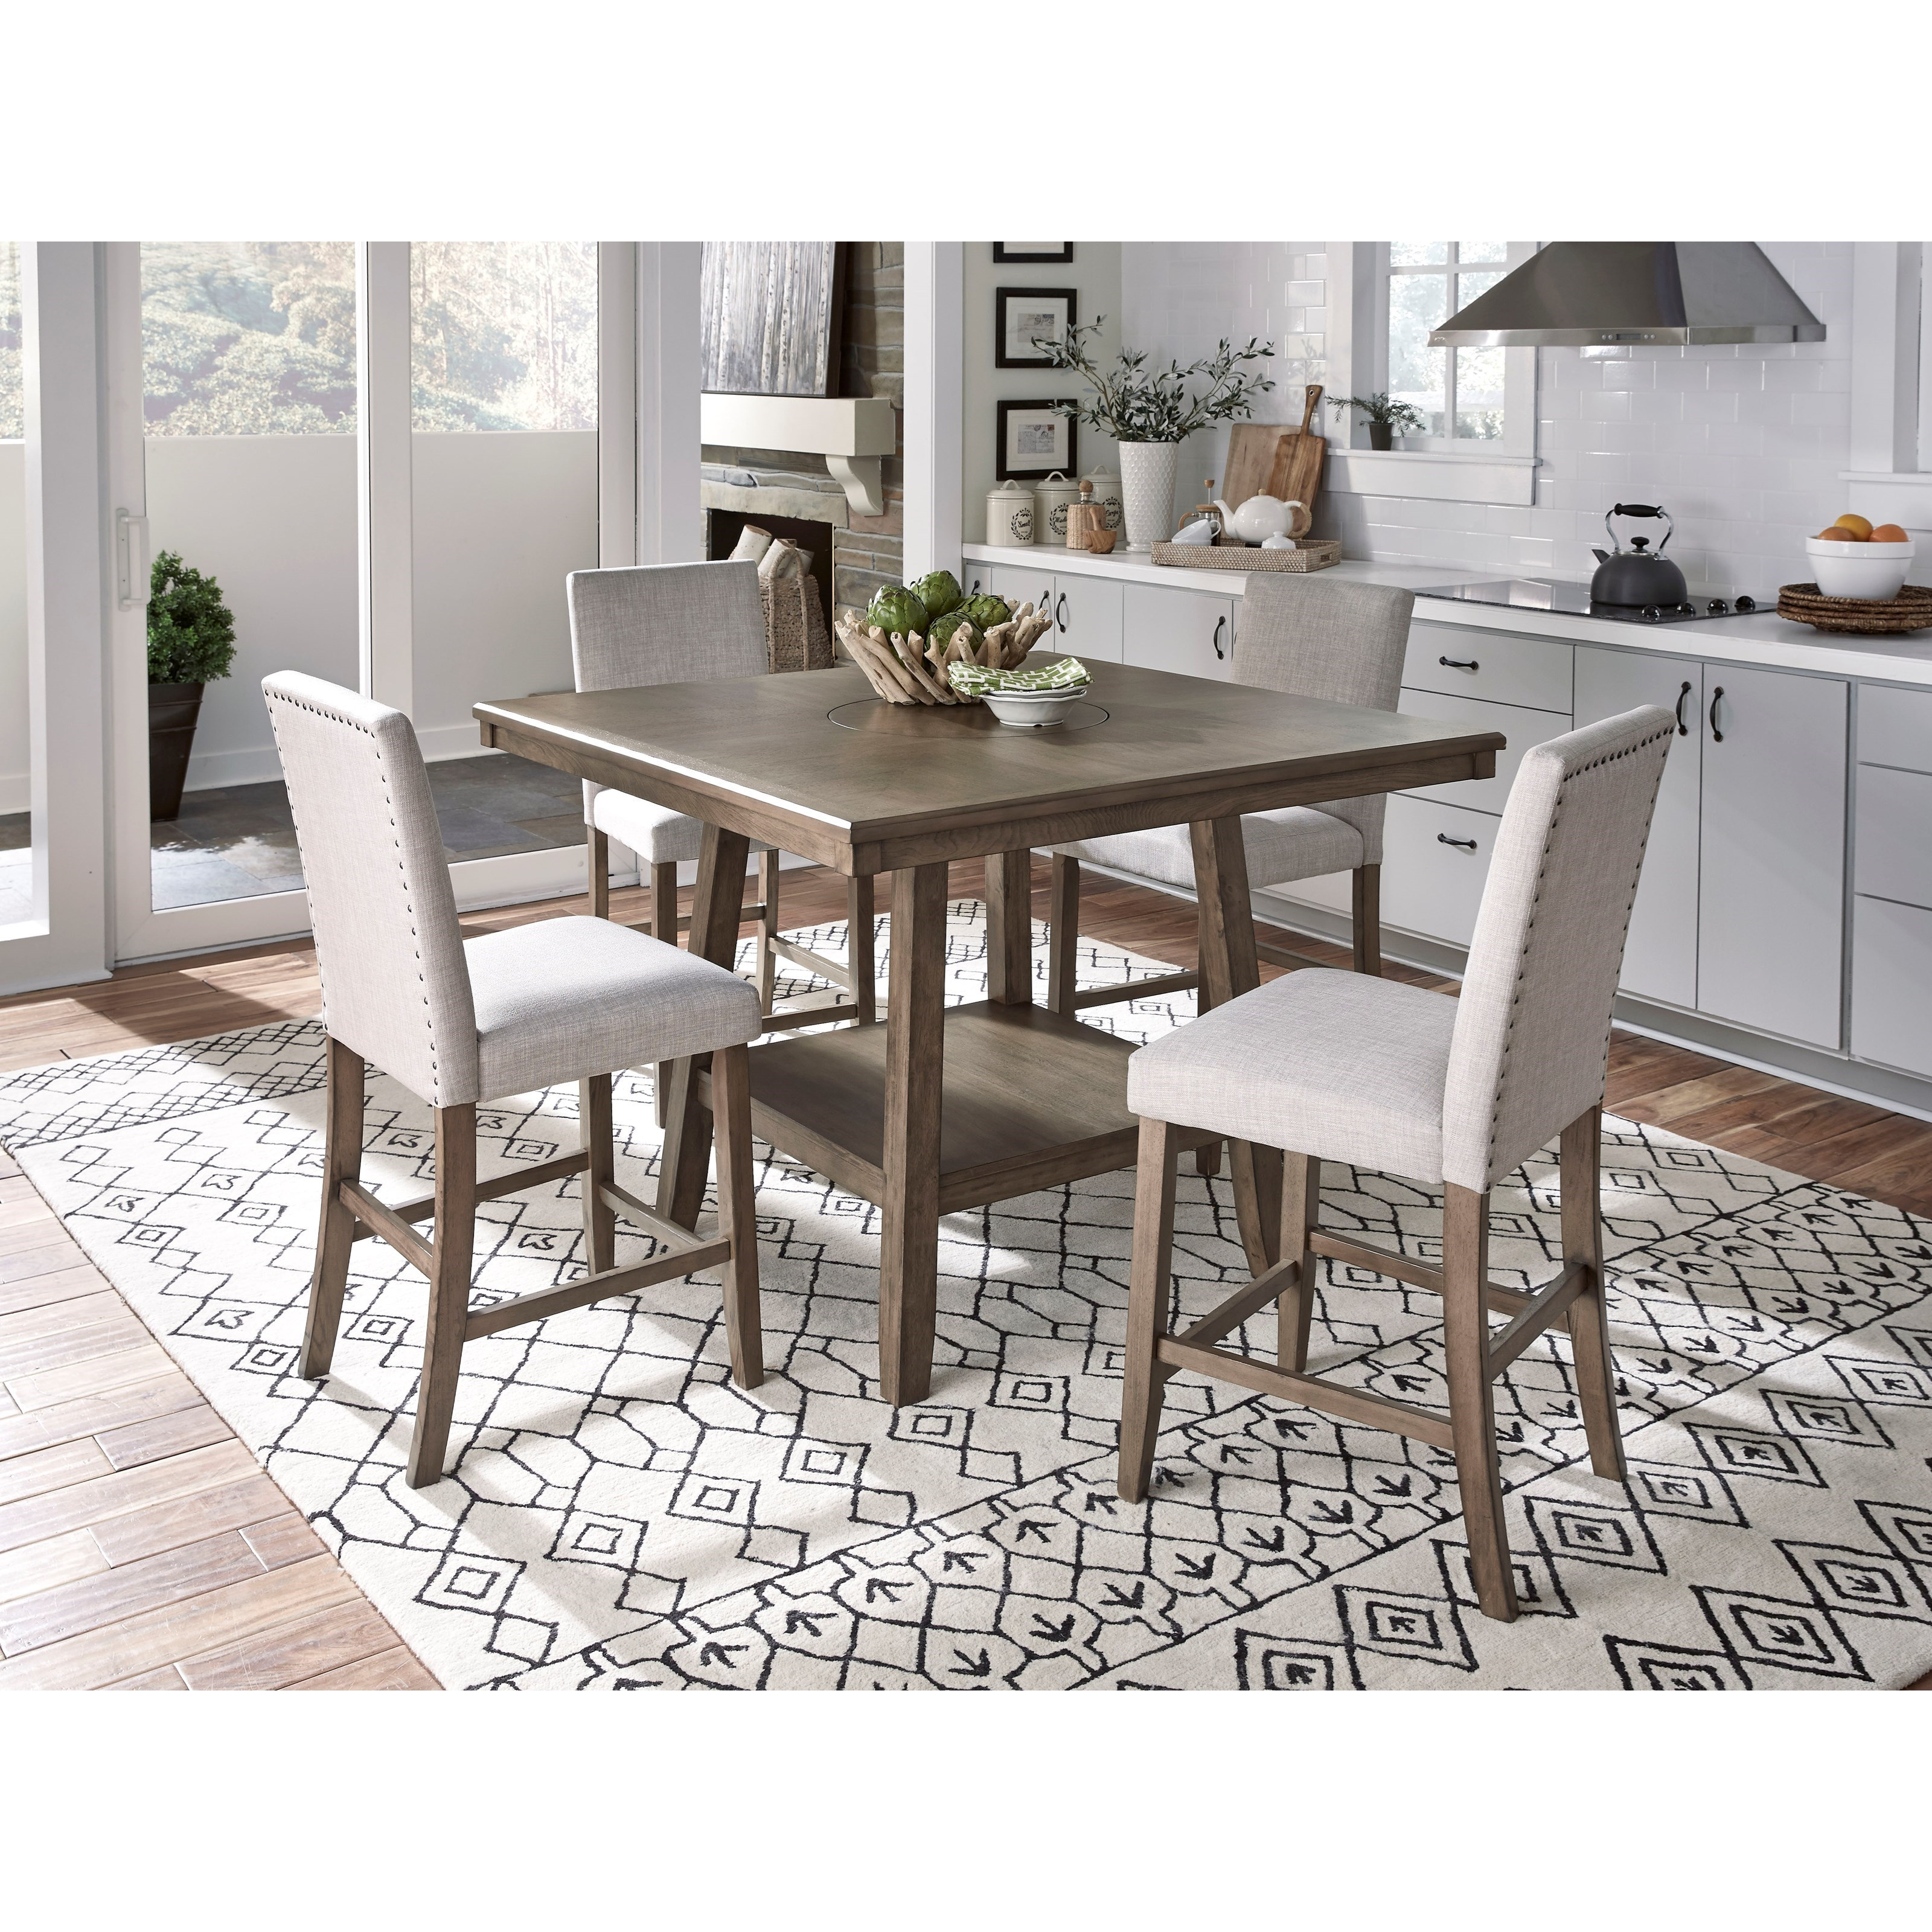 Standard Furniture Halden Transitional 5 Piece Counter Height Dining Set Royal Furniture Dining 5 Piece Sets